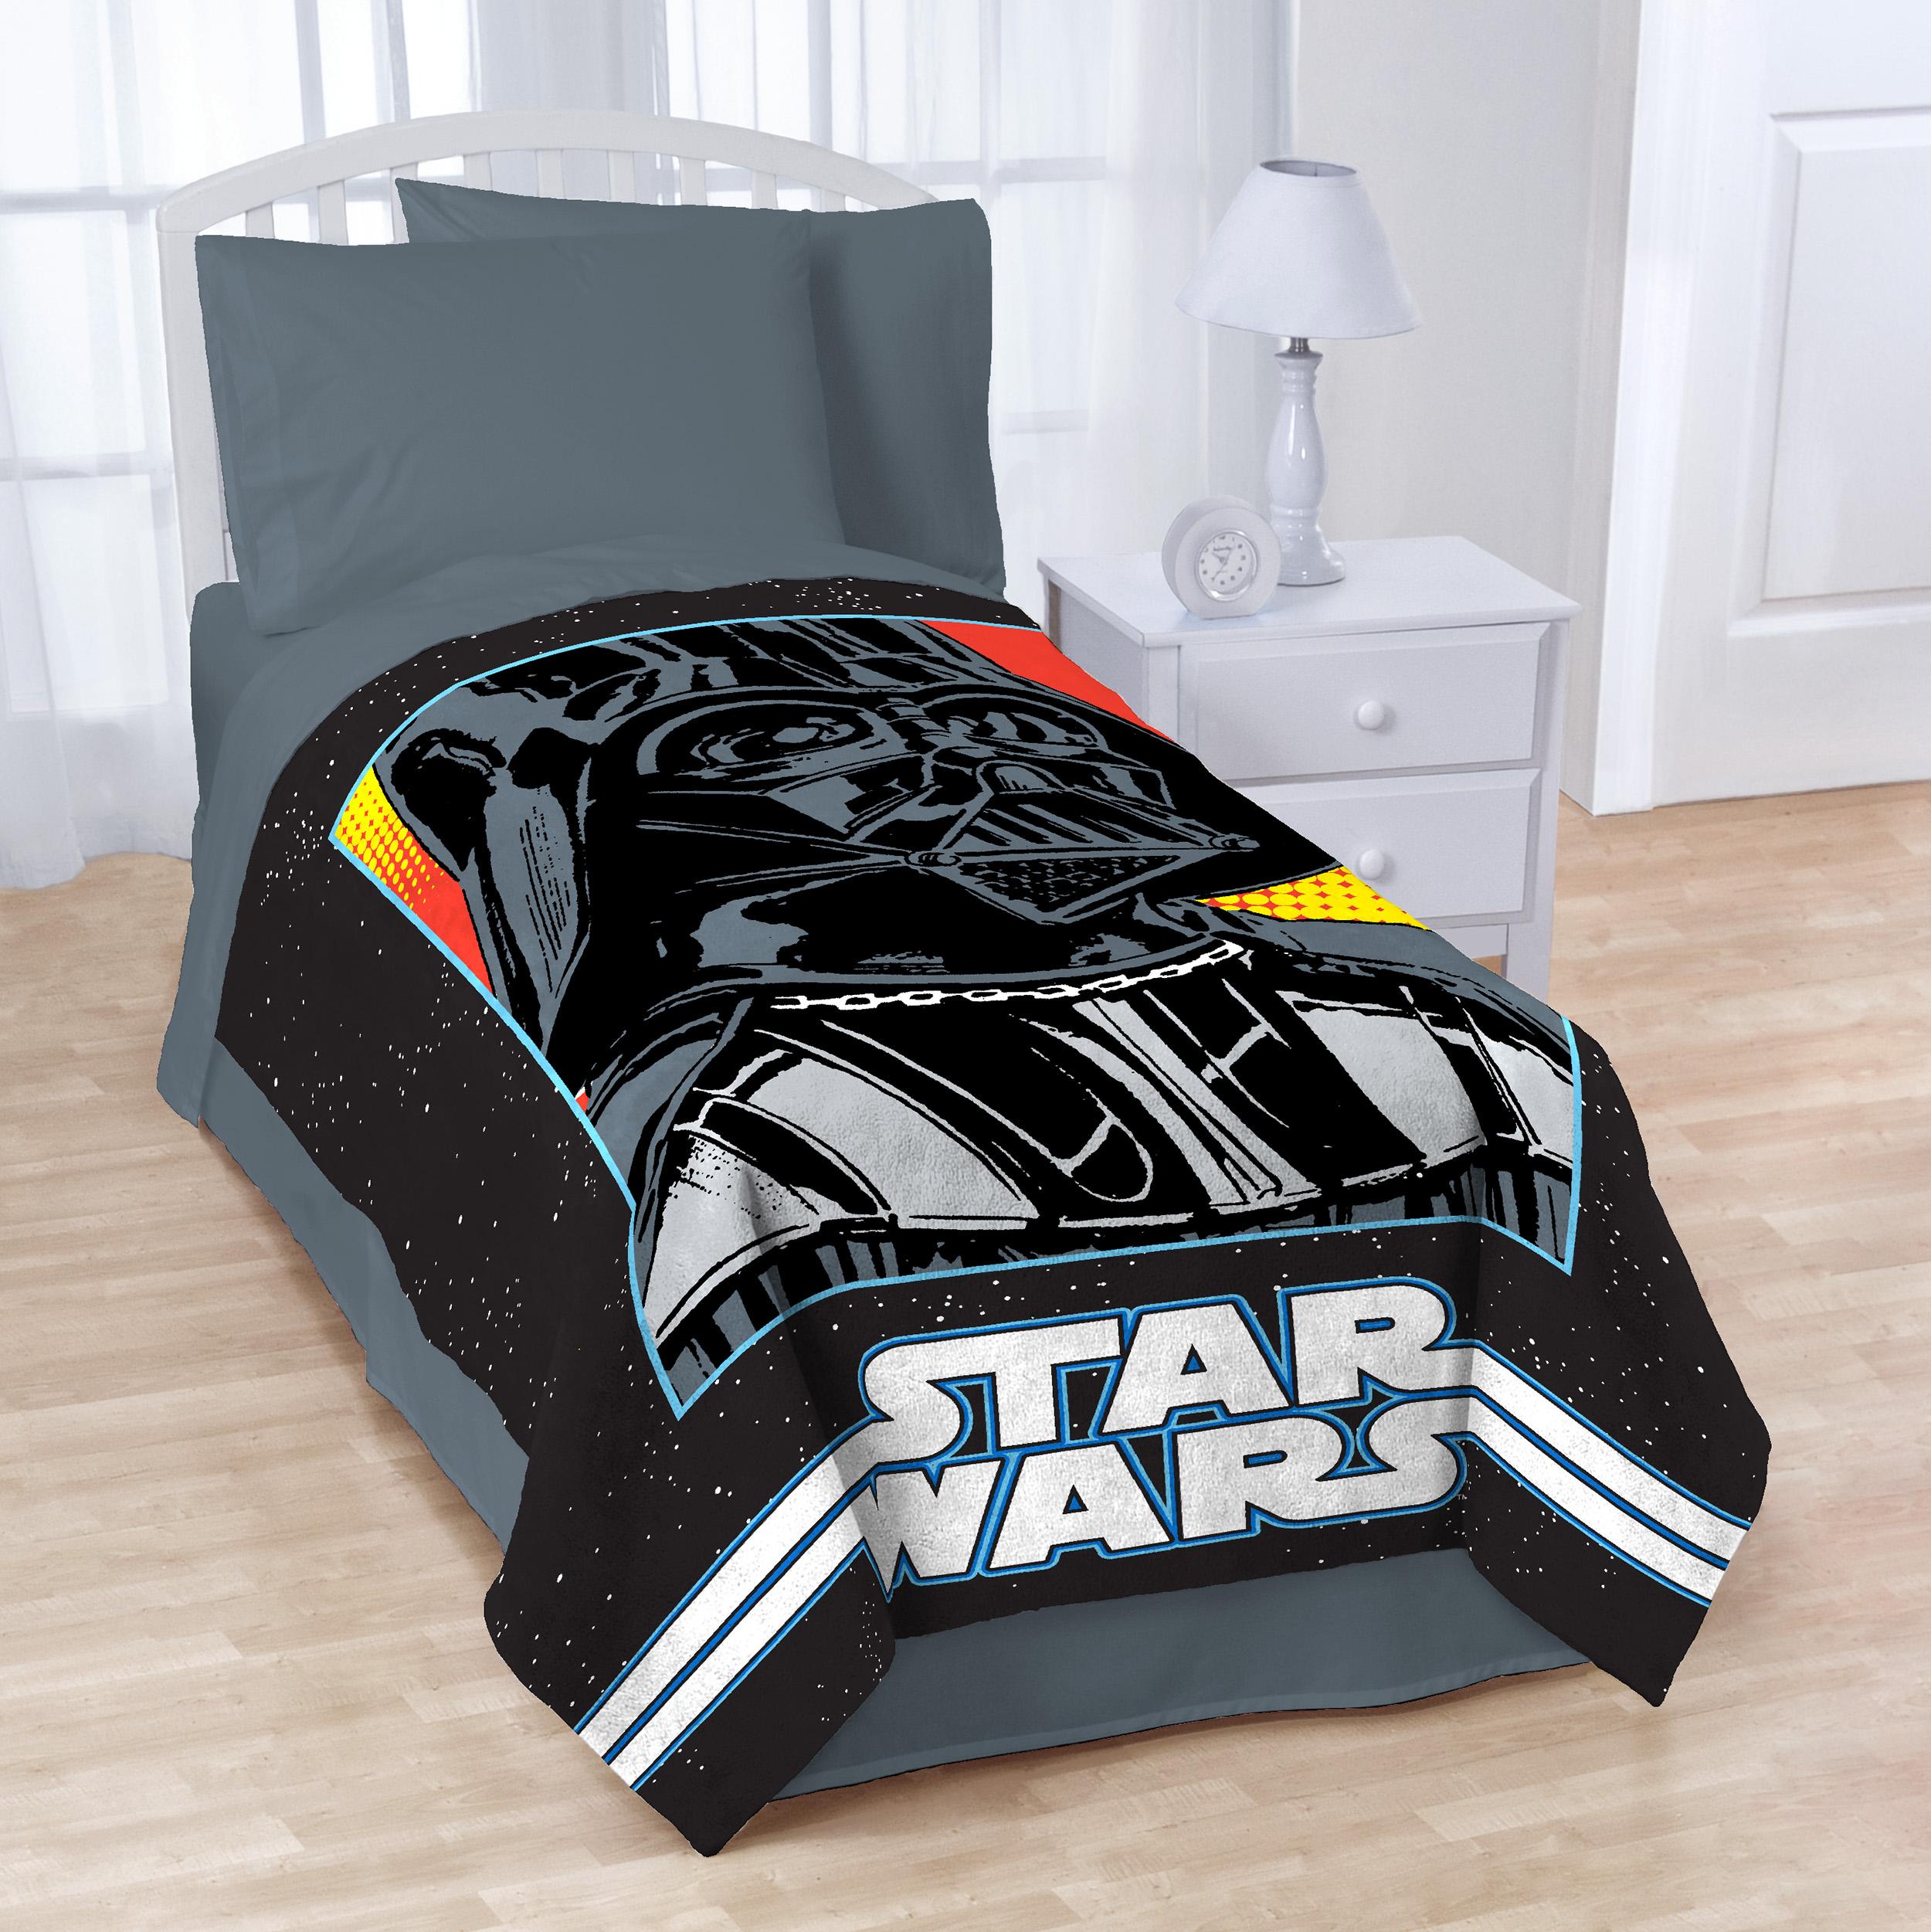 Star Wars Classic Grid Blanket...